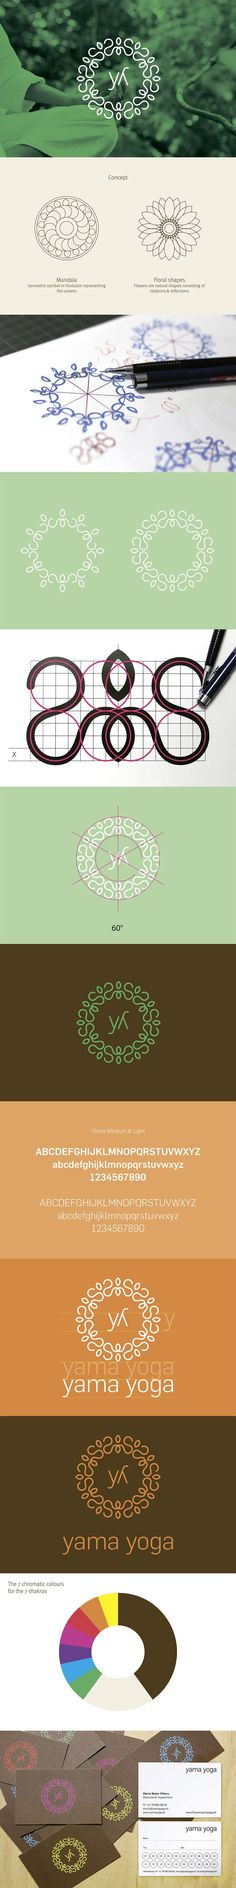 Yama Yoga // Branding by Adicto Multichannel Agency, via Behance: